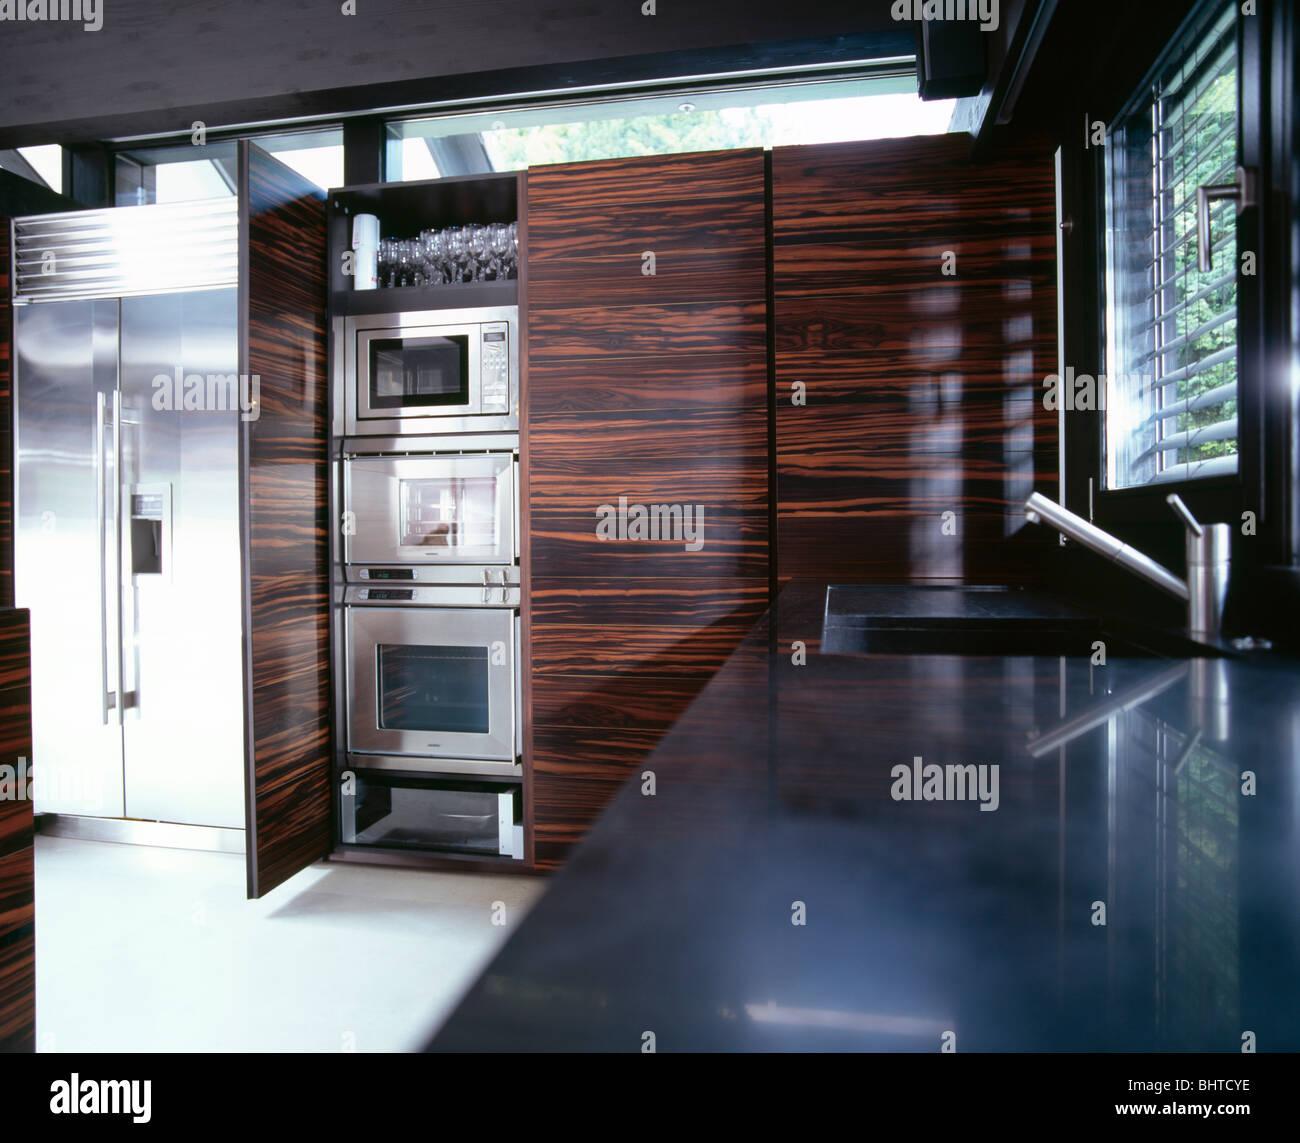 Acier inoxydable grand frigo congélateur dans la cuisine moderne ...